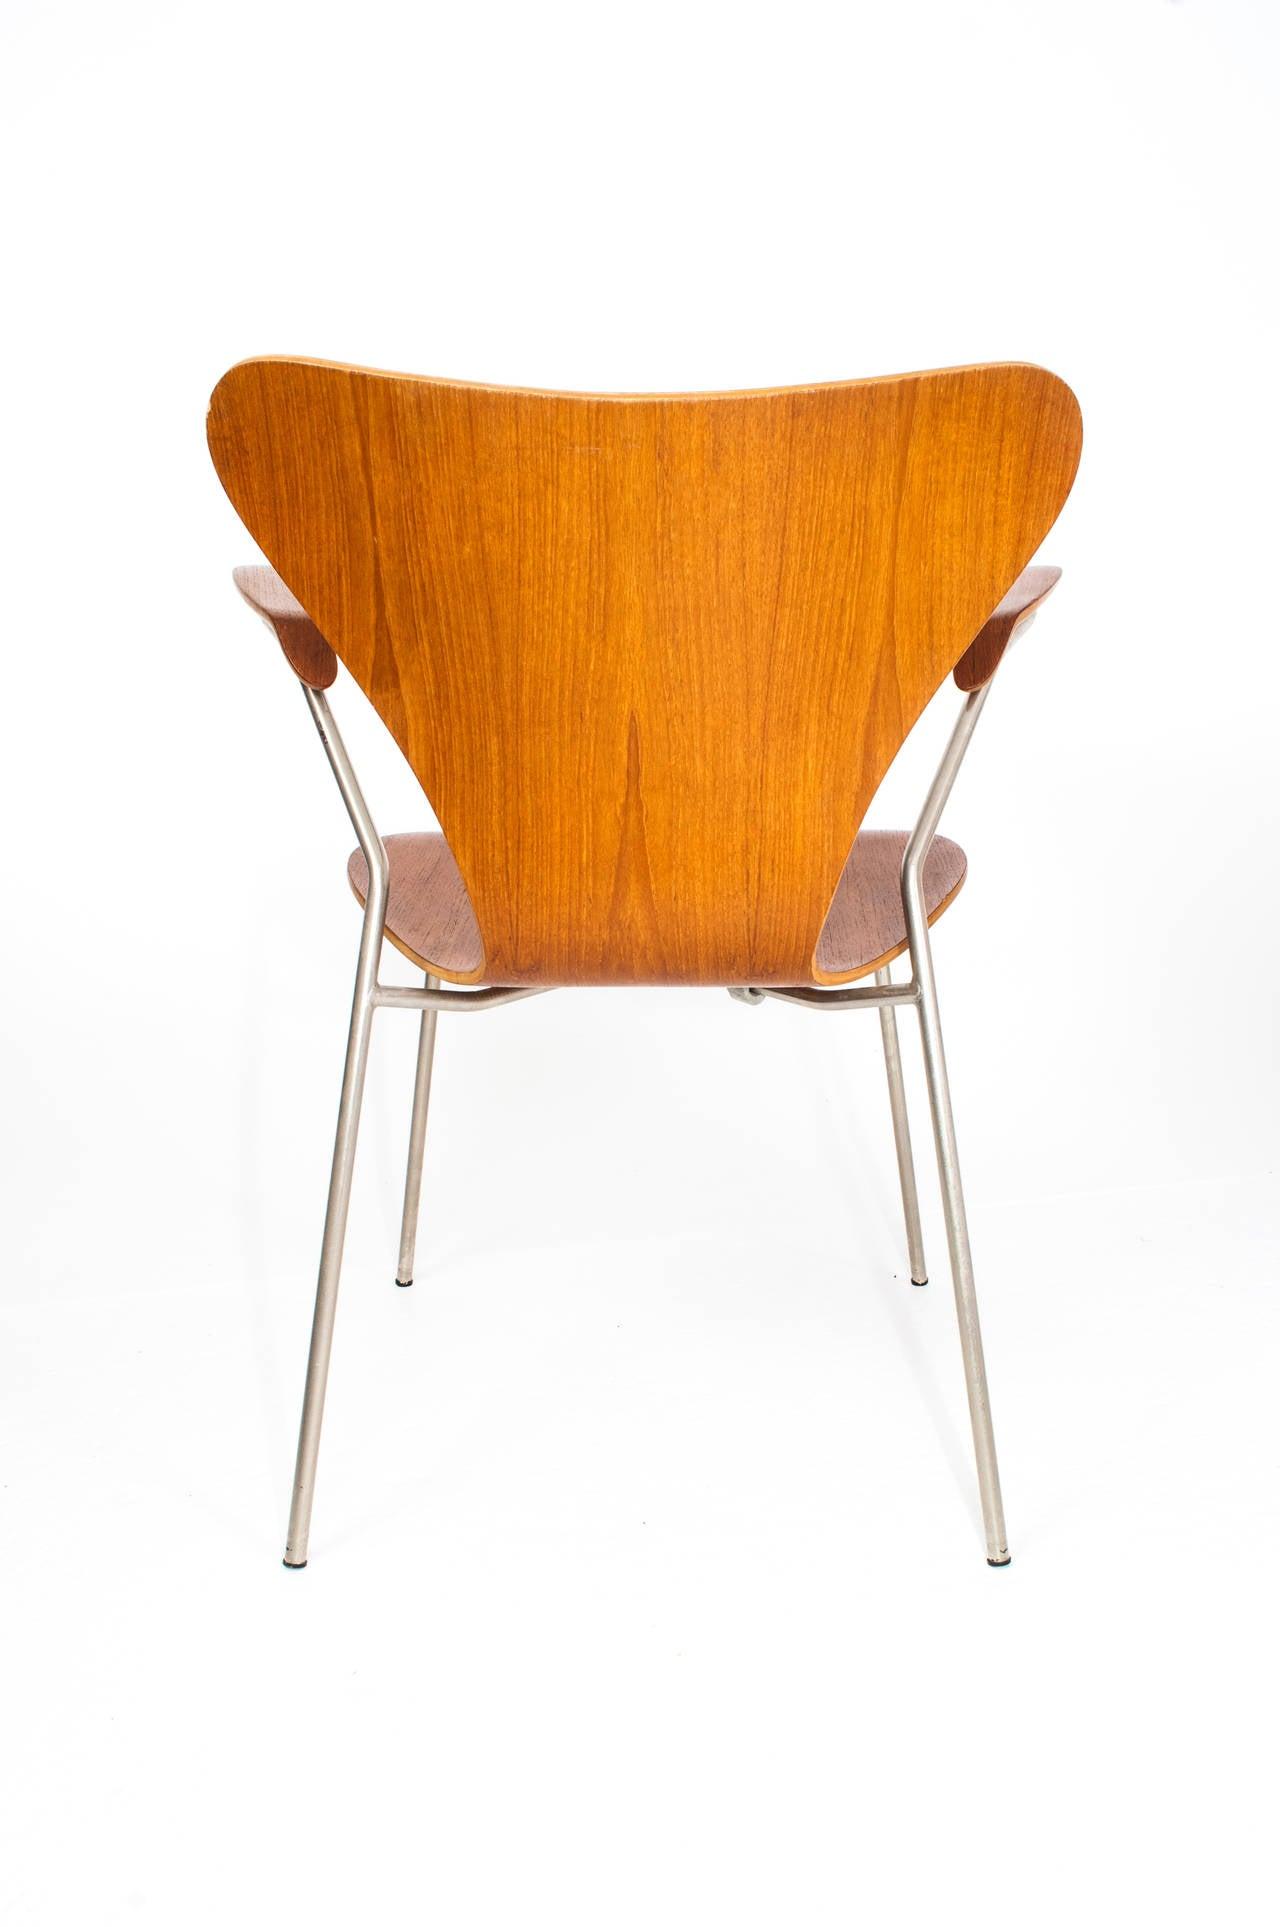 Arne Jacobsen Series Seven Teak Chairs 3207 at 1stdibs